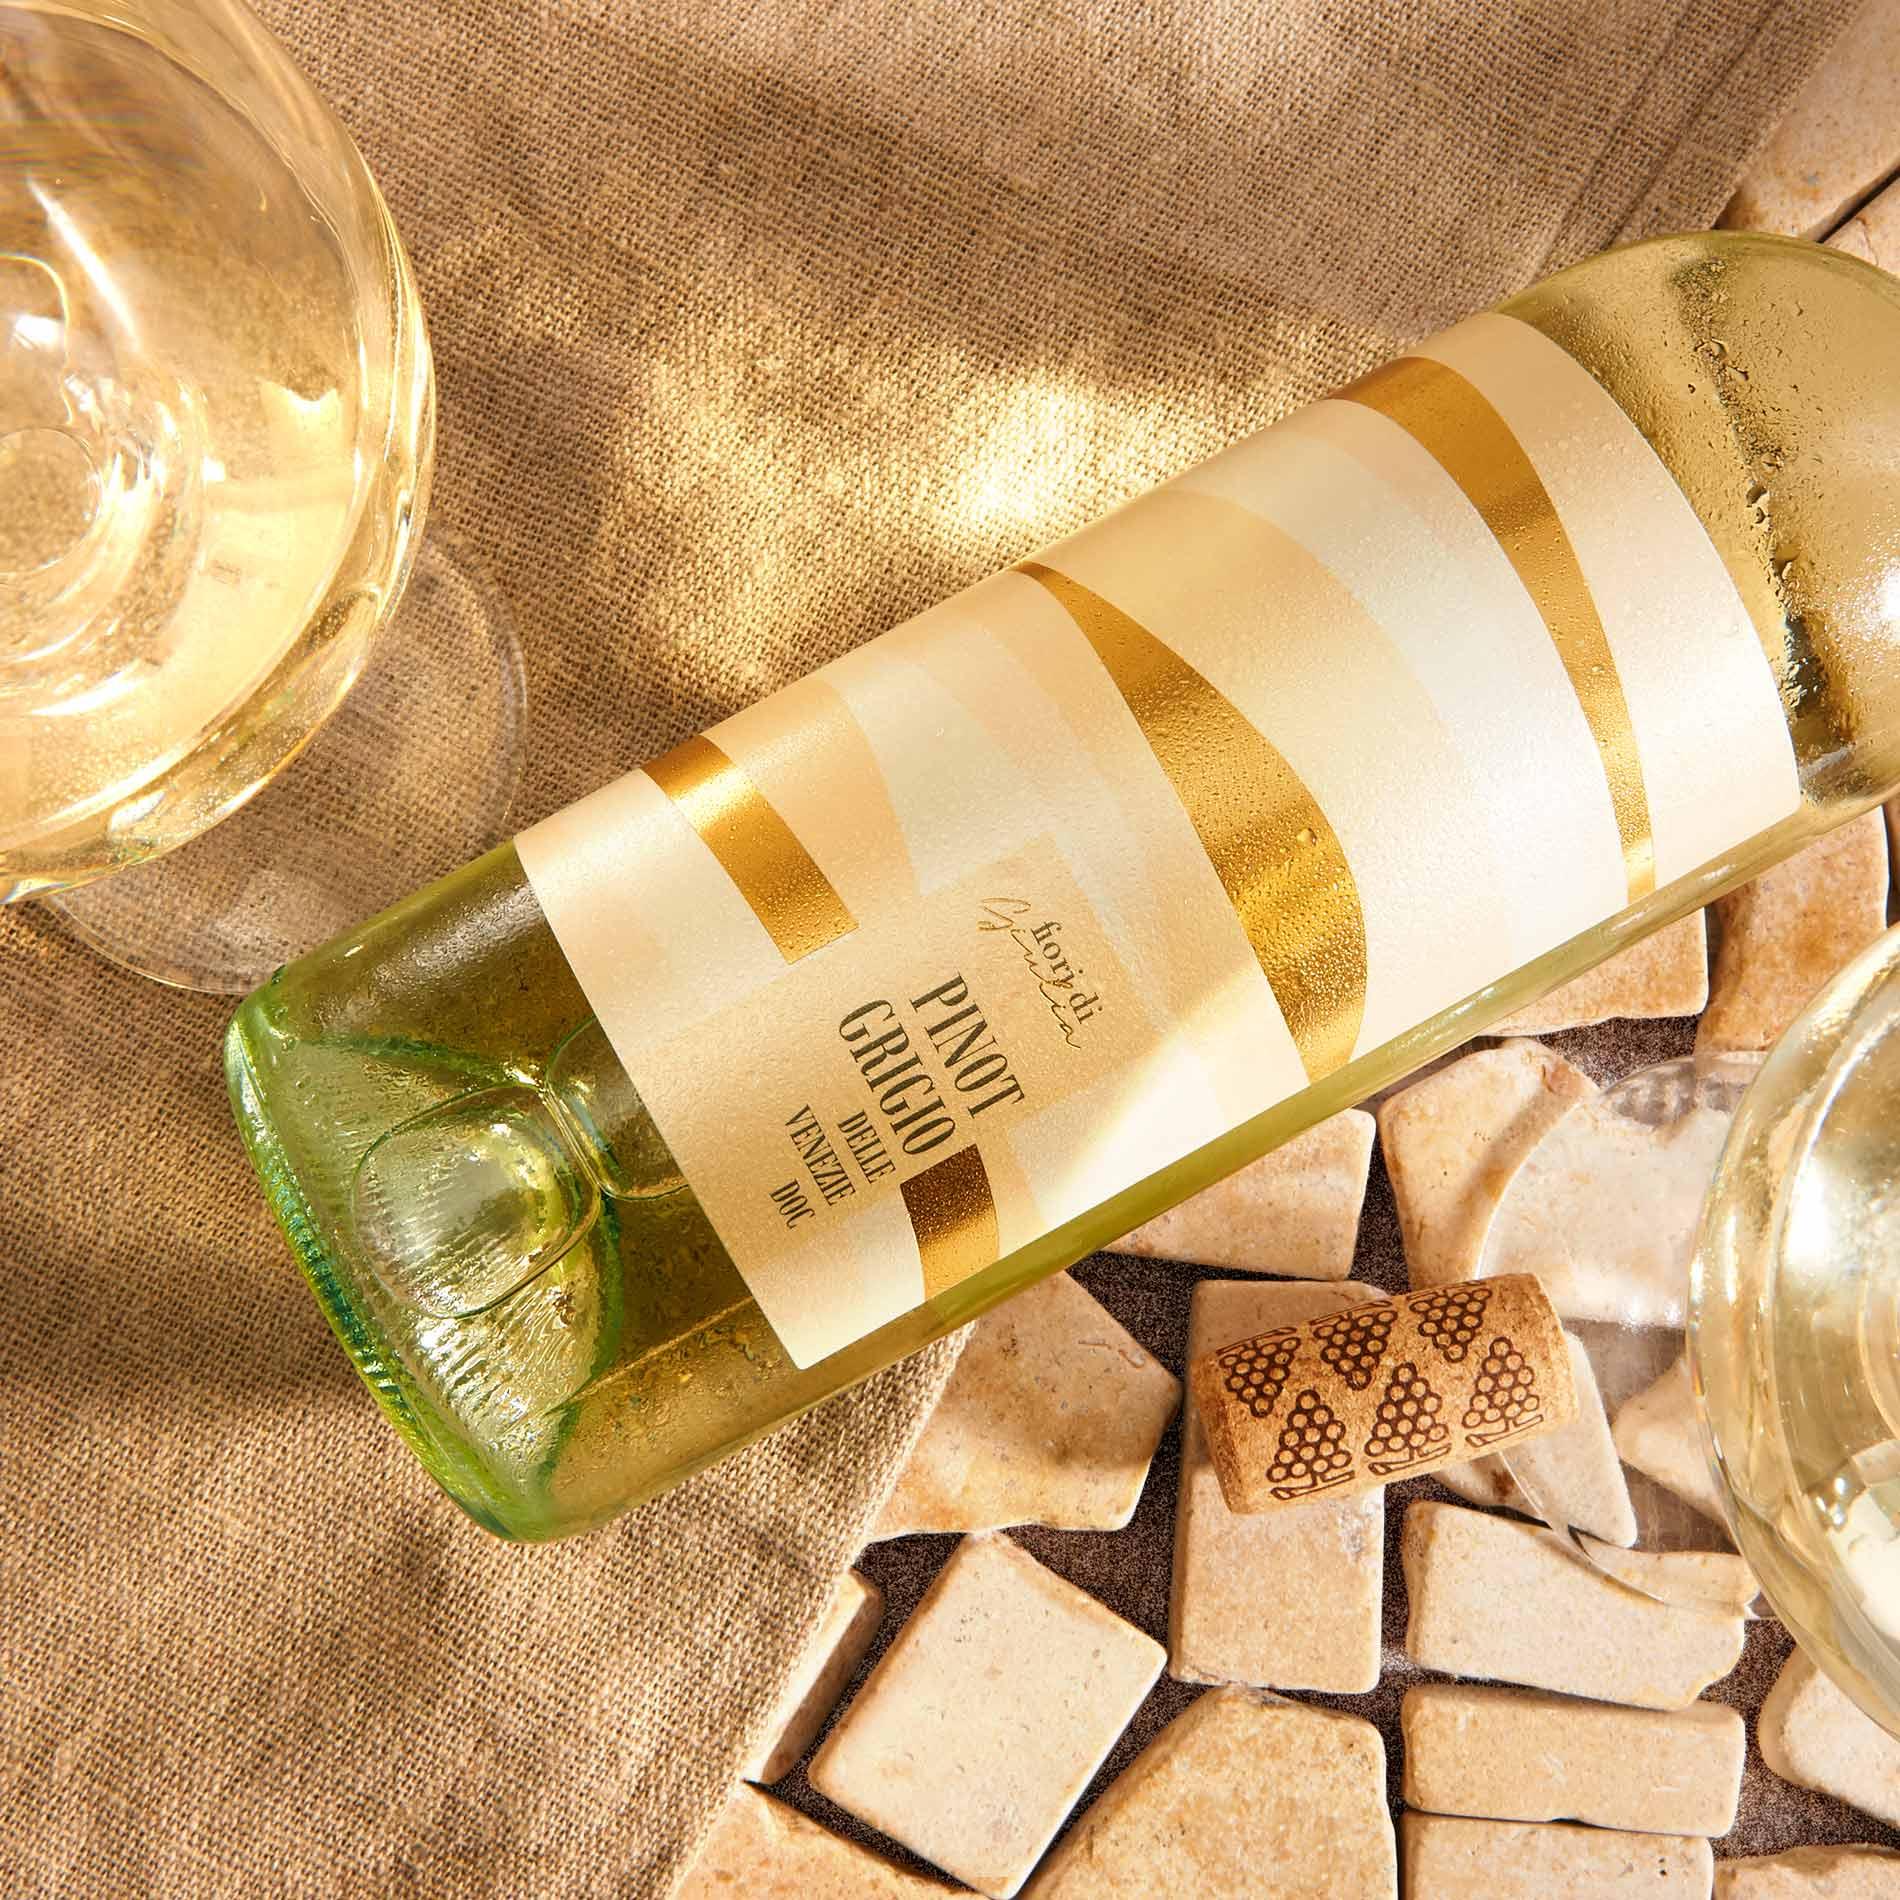 Pinot Grigio – Entdecke den Weißweinklassiker!